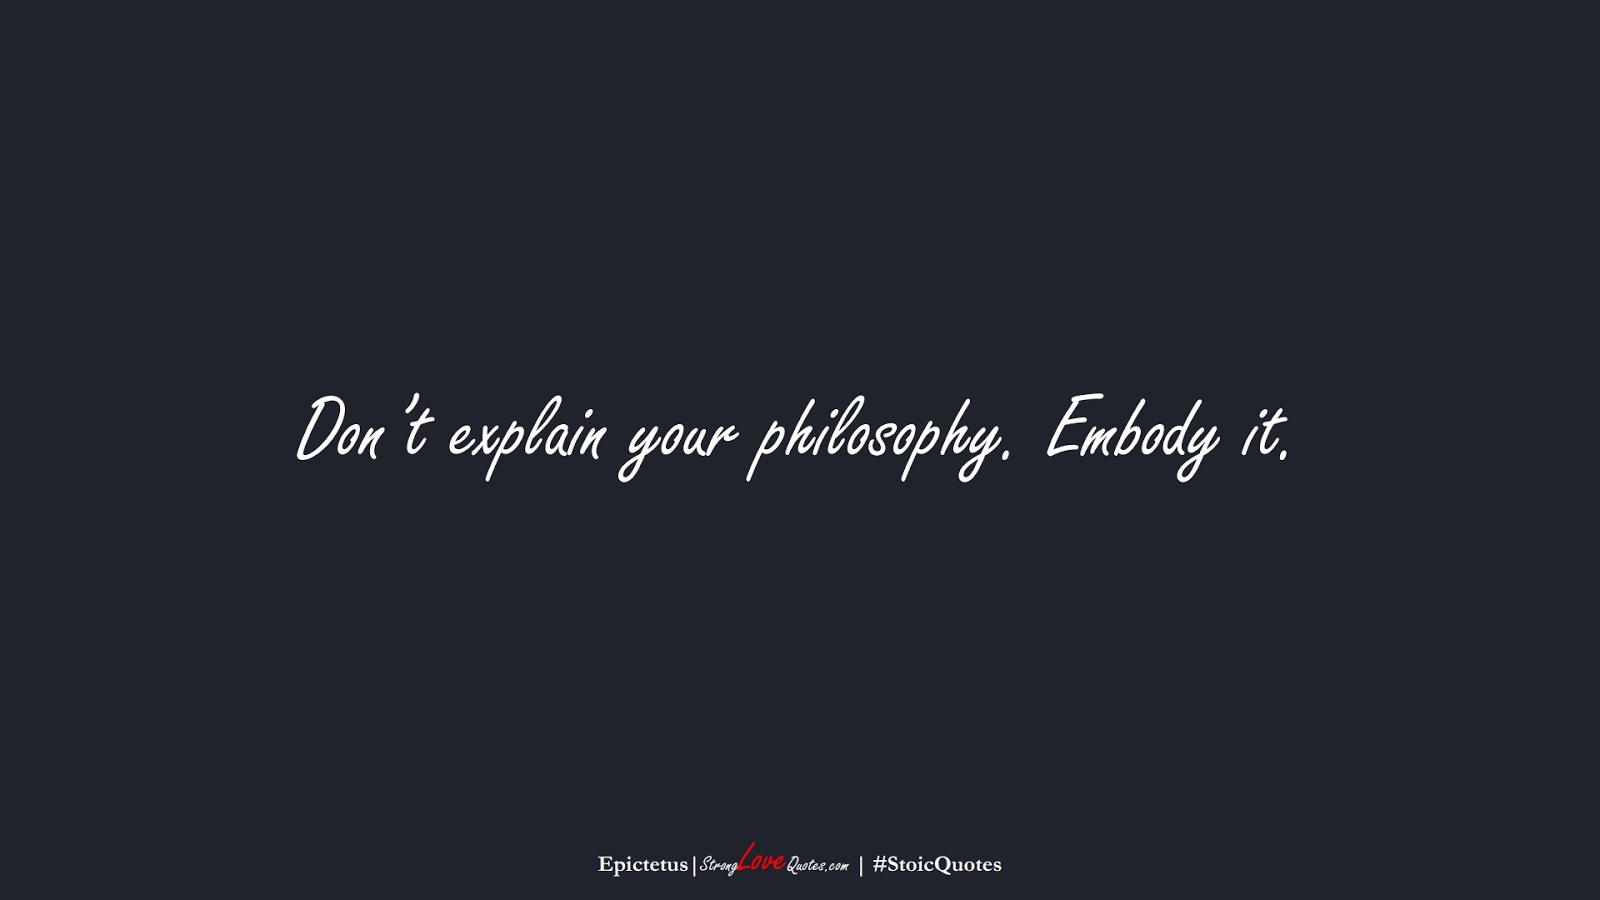 Don't explain your philosophy. Embody it. (Epictetus);  #StoicQuotes